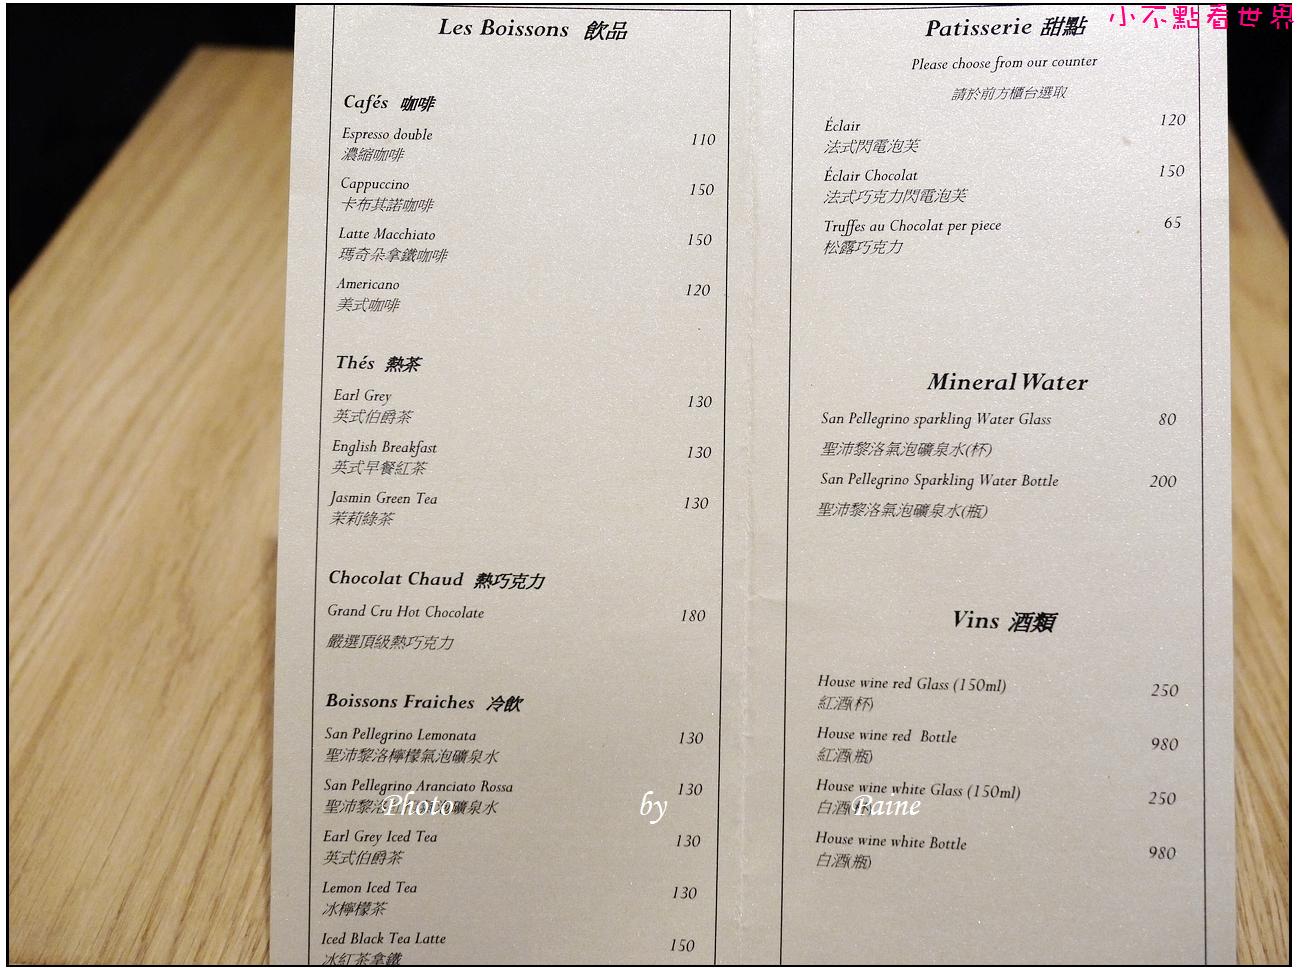 台北1789 Cafe 閃電泡芙 Patisserie Cyrille Courant